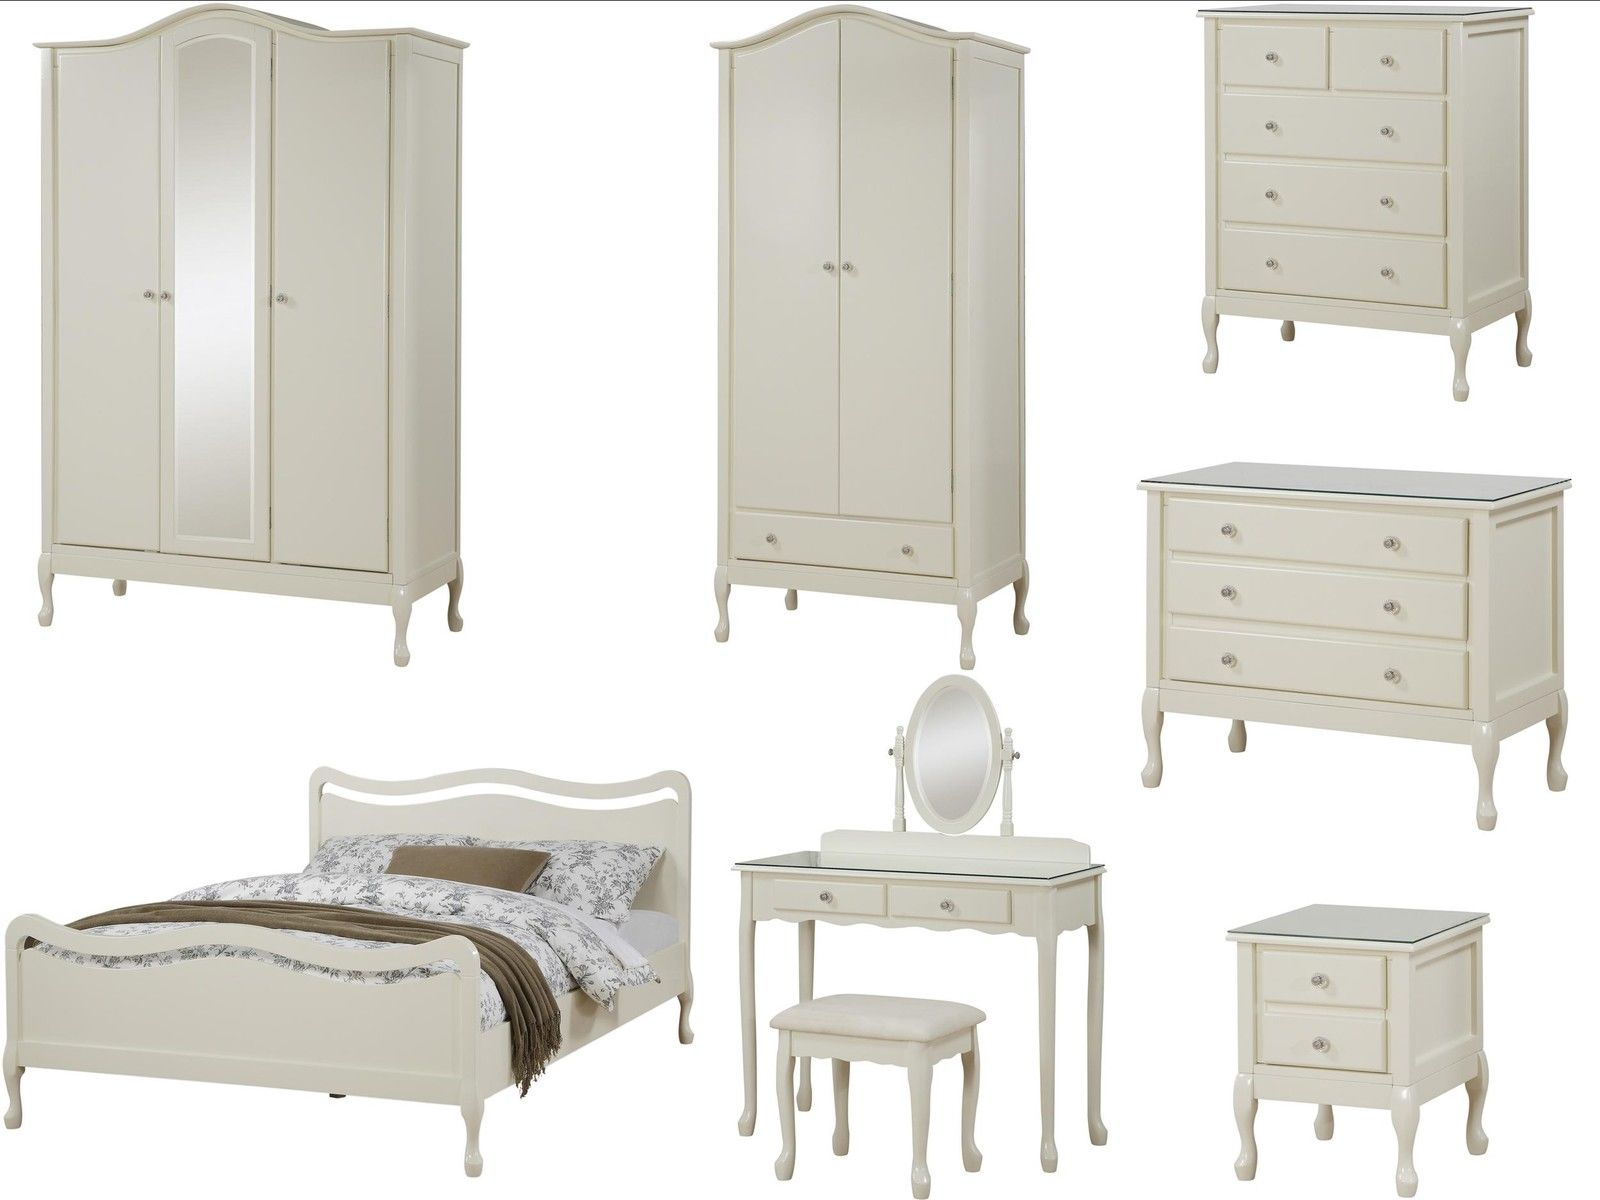 Loire Shabby Chic Ivory Bedroom Furniture  Wardrobe